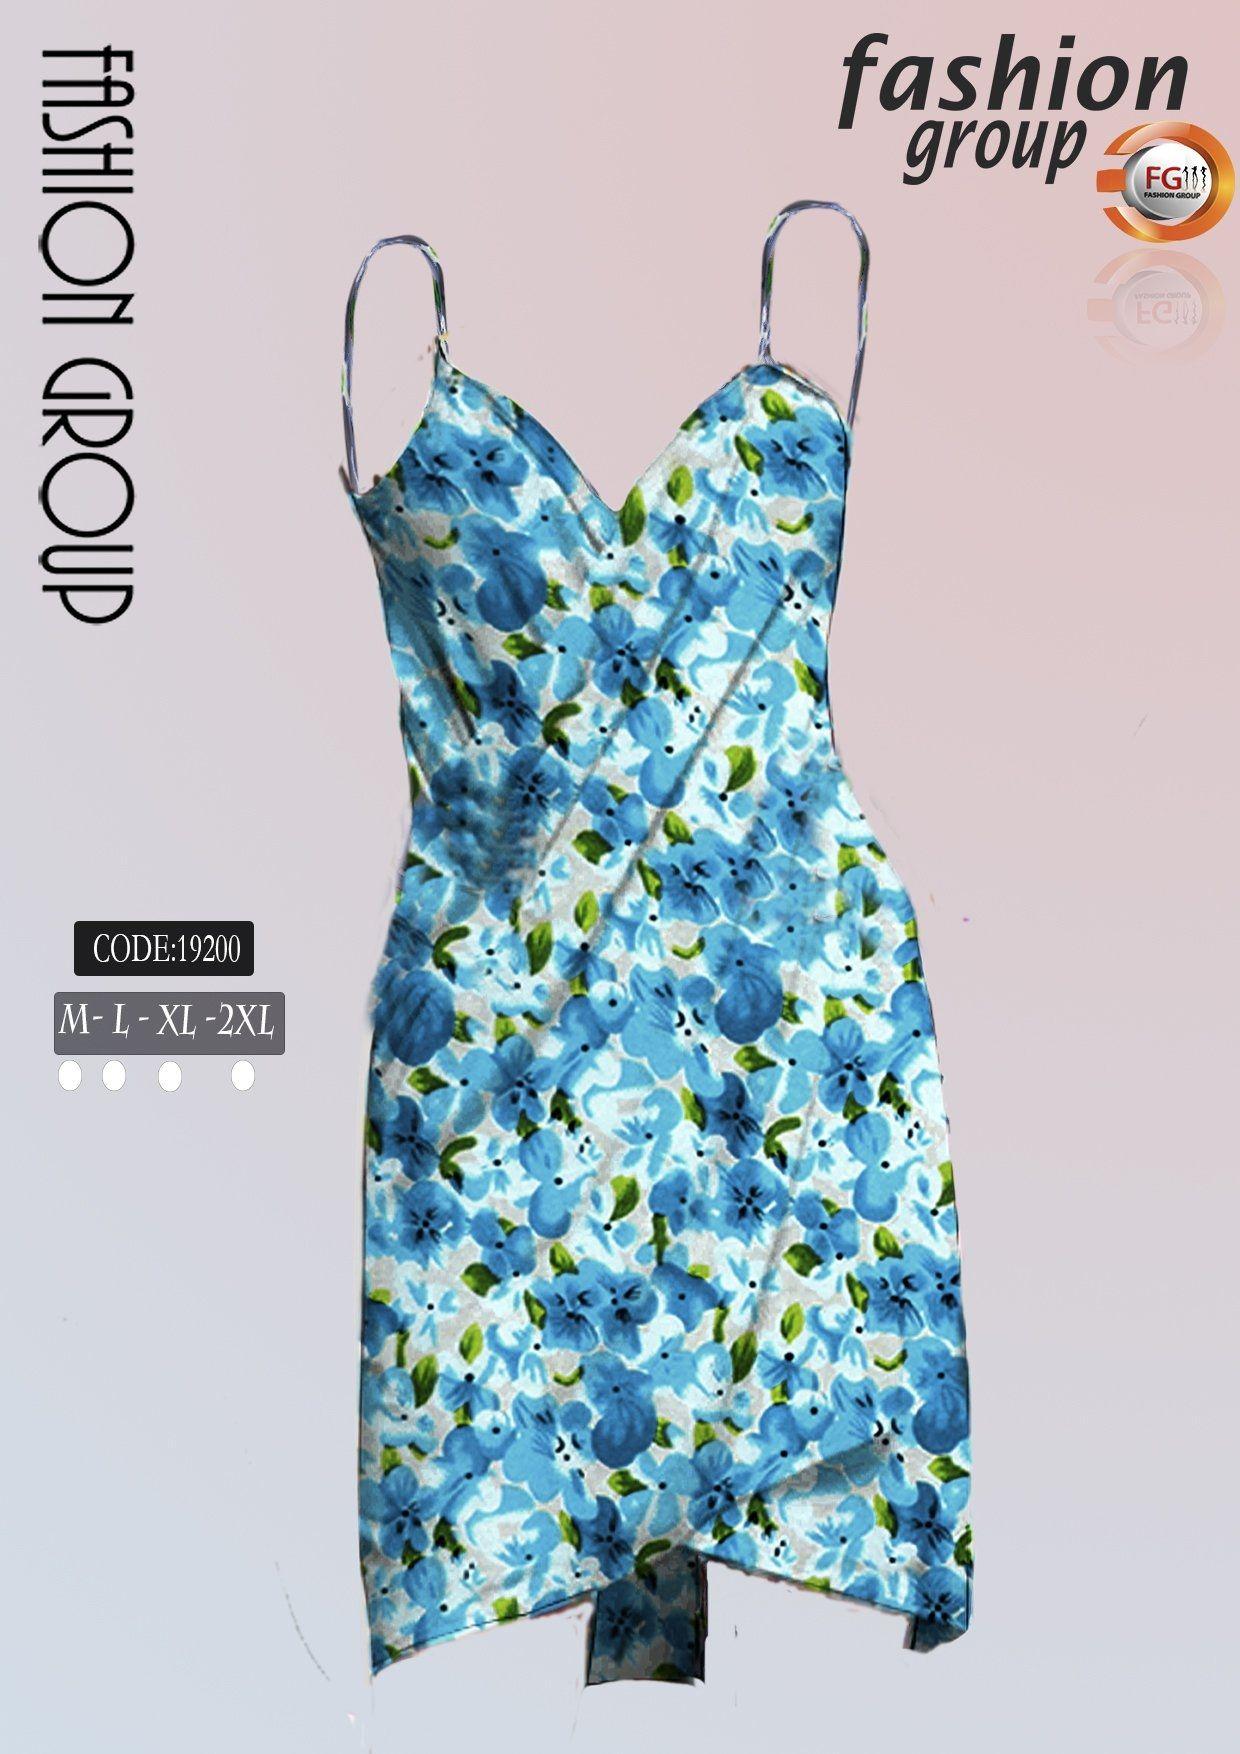 FashionGroup Greek Goddess Spaghetti Strap Sarong Beachwear - Aqua